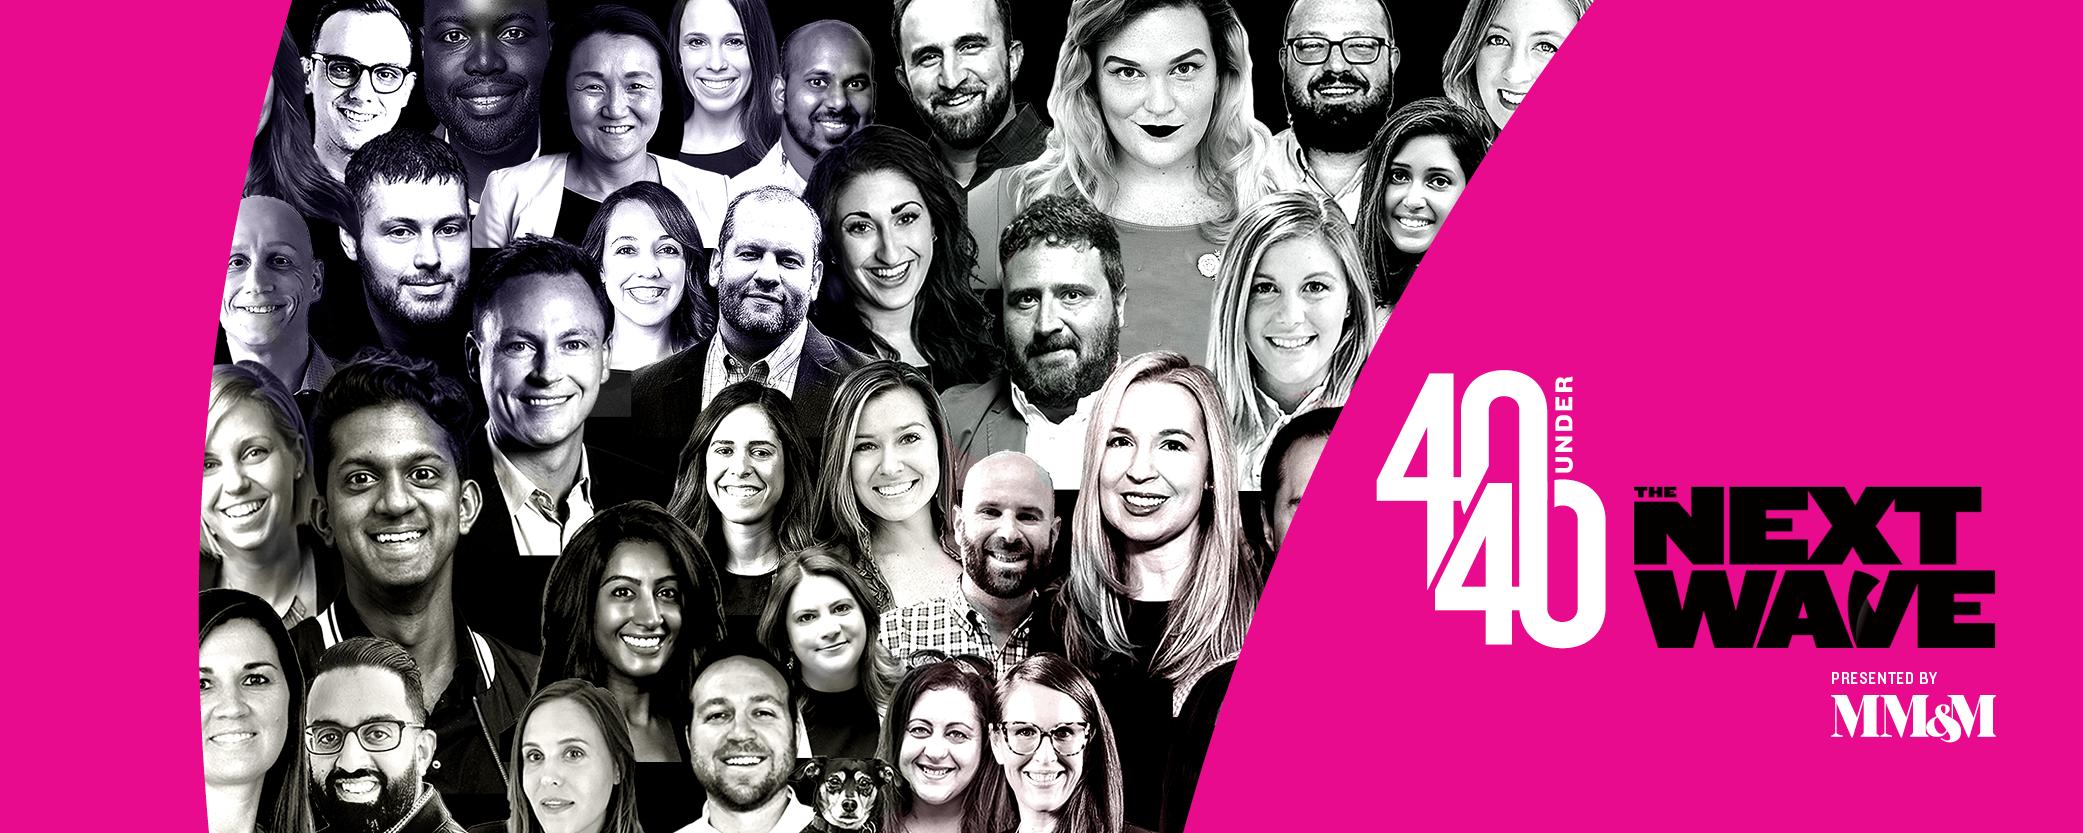 MM&M 40 Under 40: The Next Wave